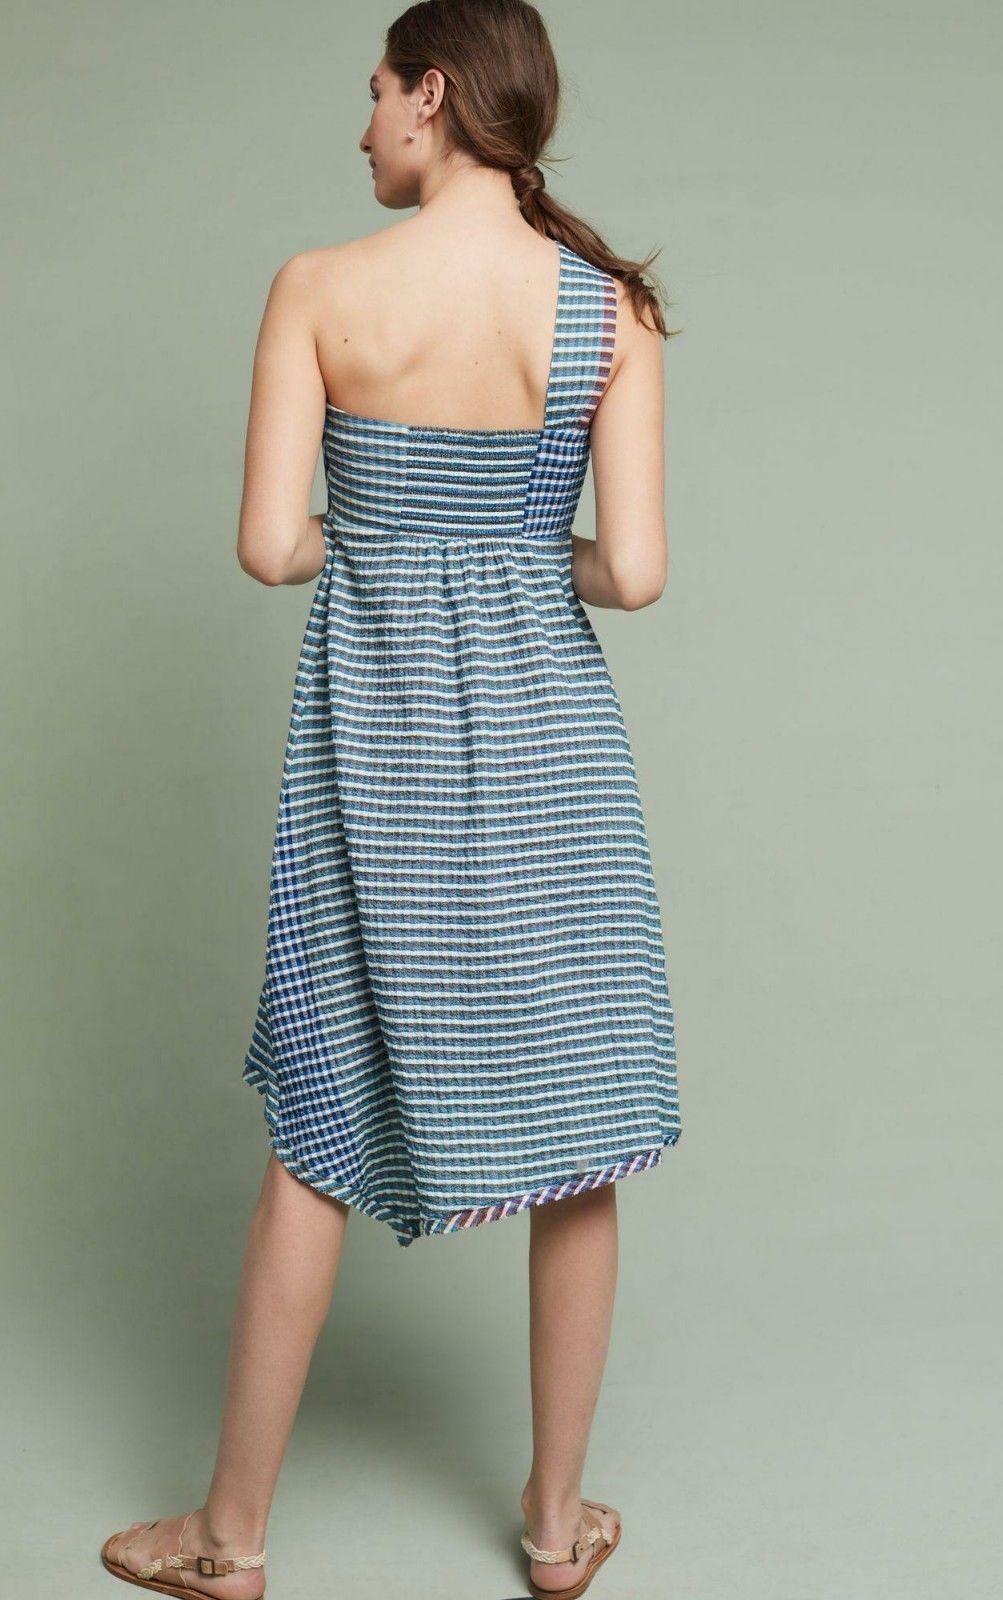 NWT $138 Anthropologie Waverly Dress by Maeve One-Shoulder Midi  Hanky Hem Sz 14